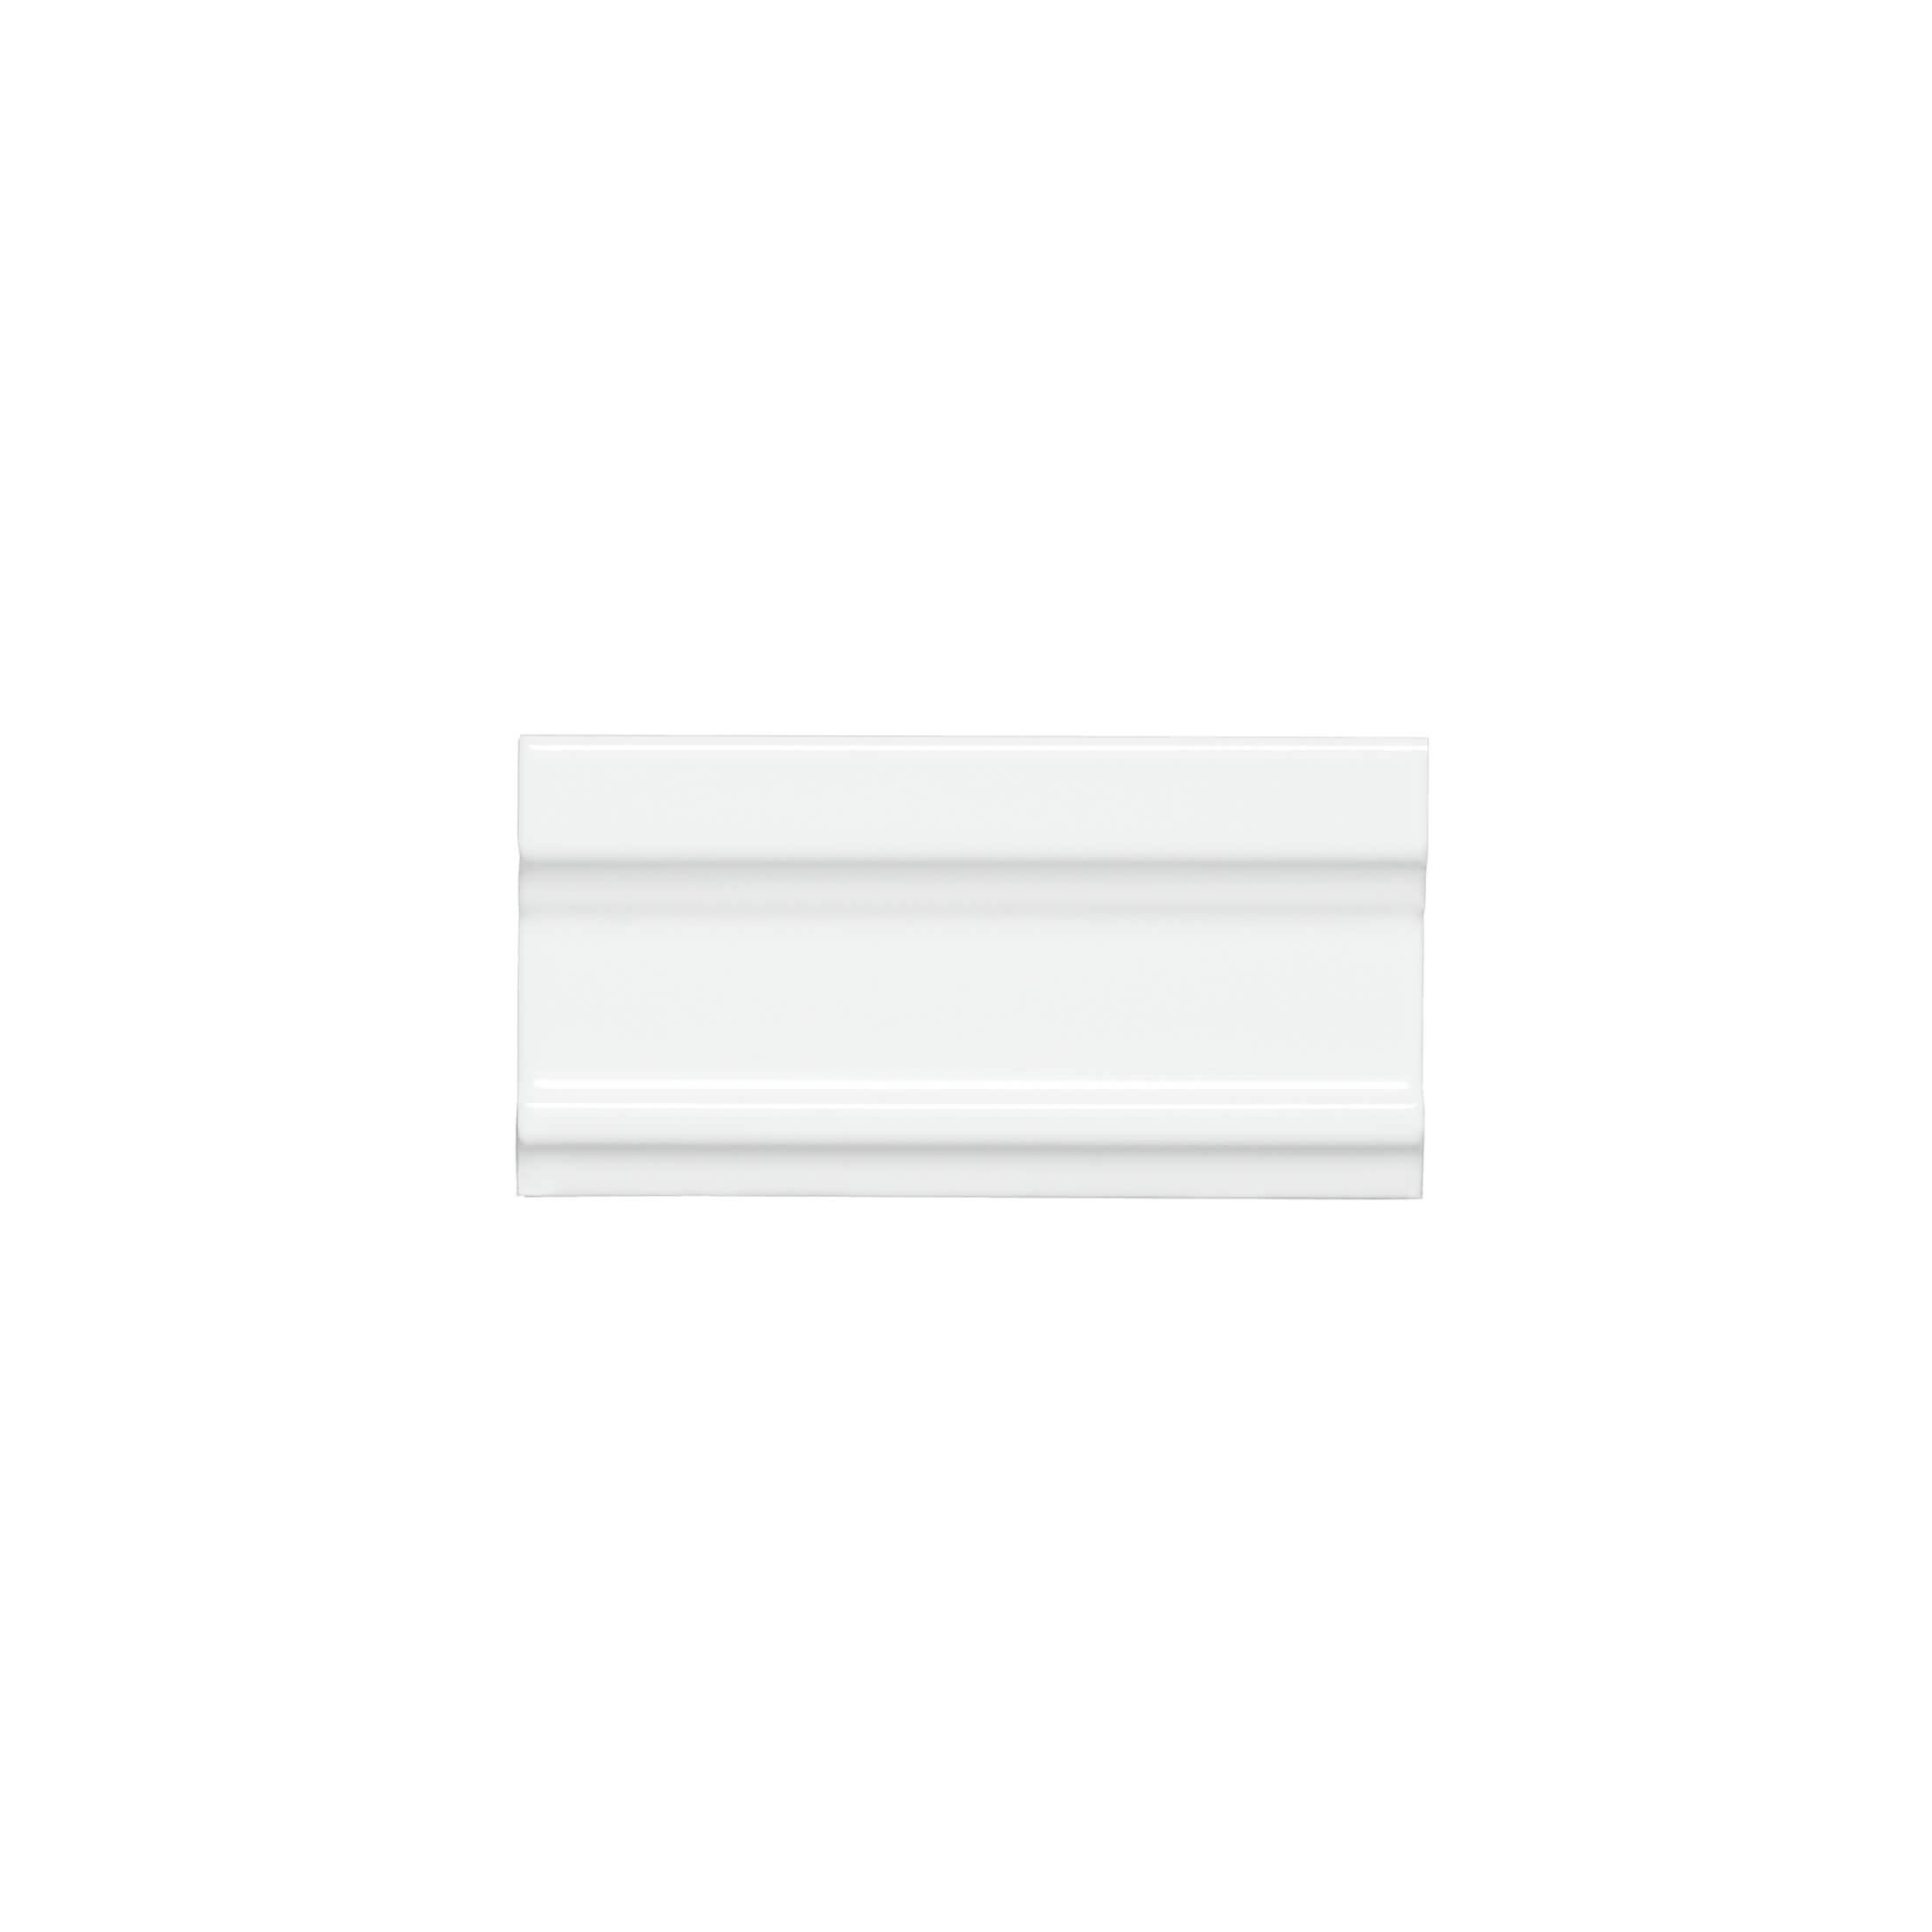 ADNE5324 - CORNISA CLASICA - 7.5 cm X 15 cm